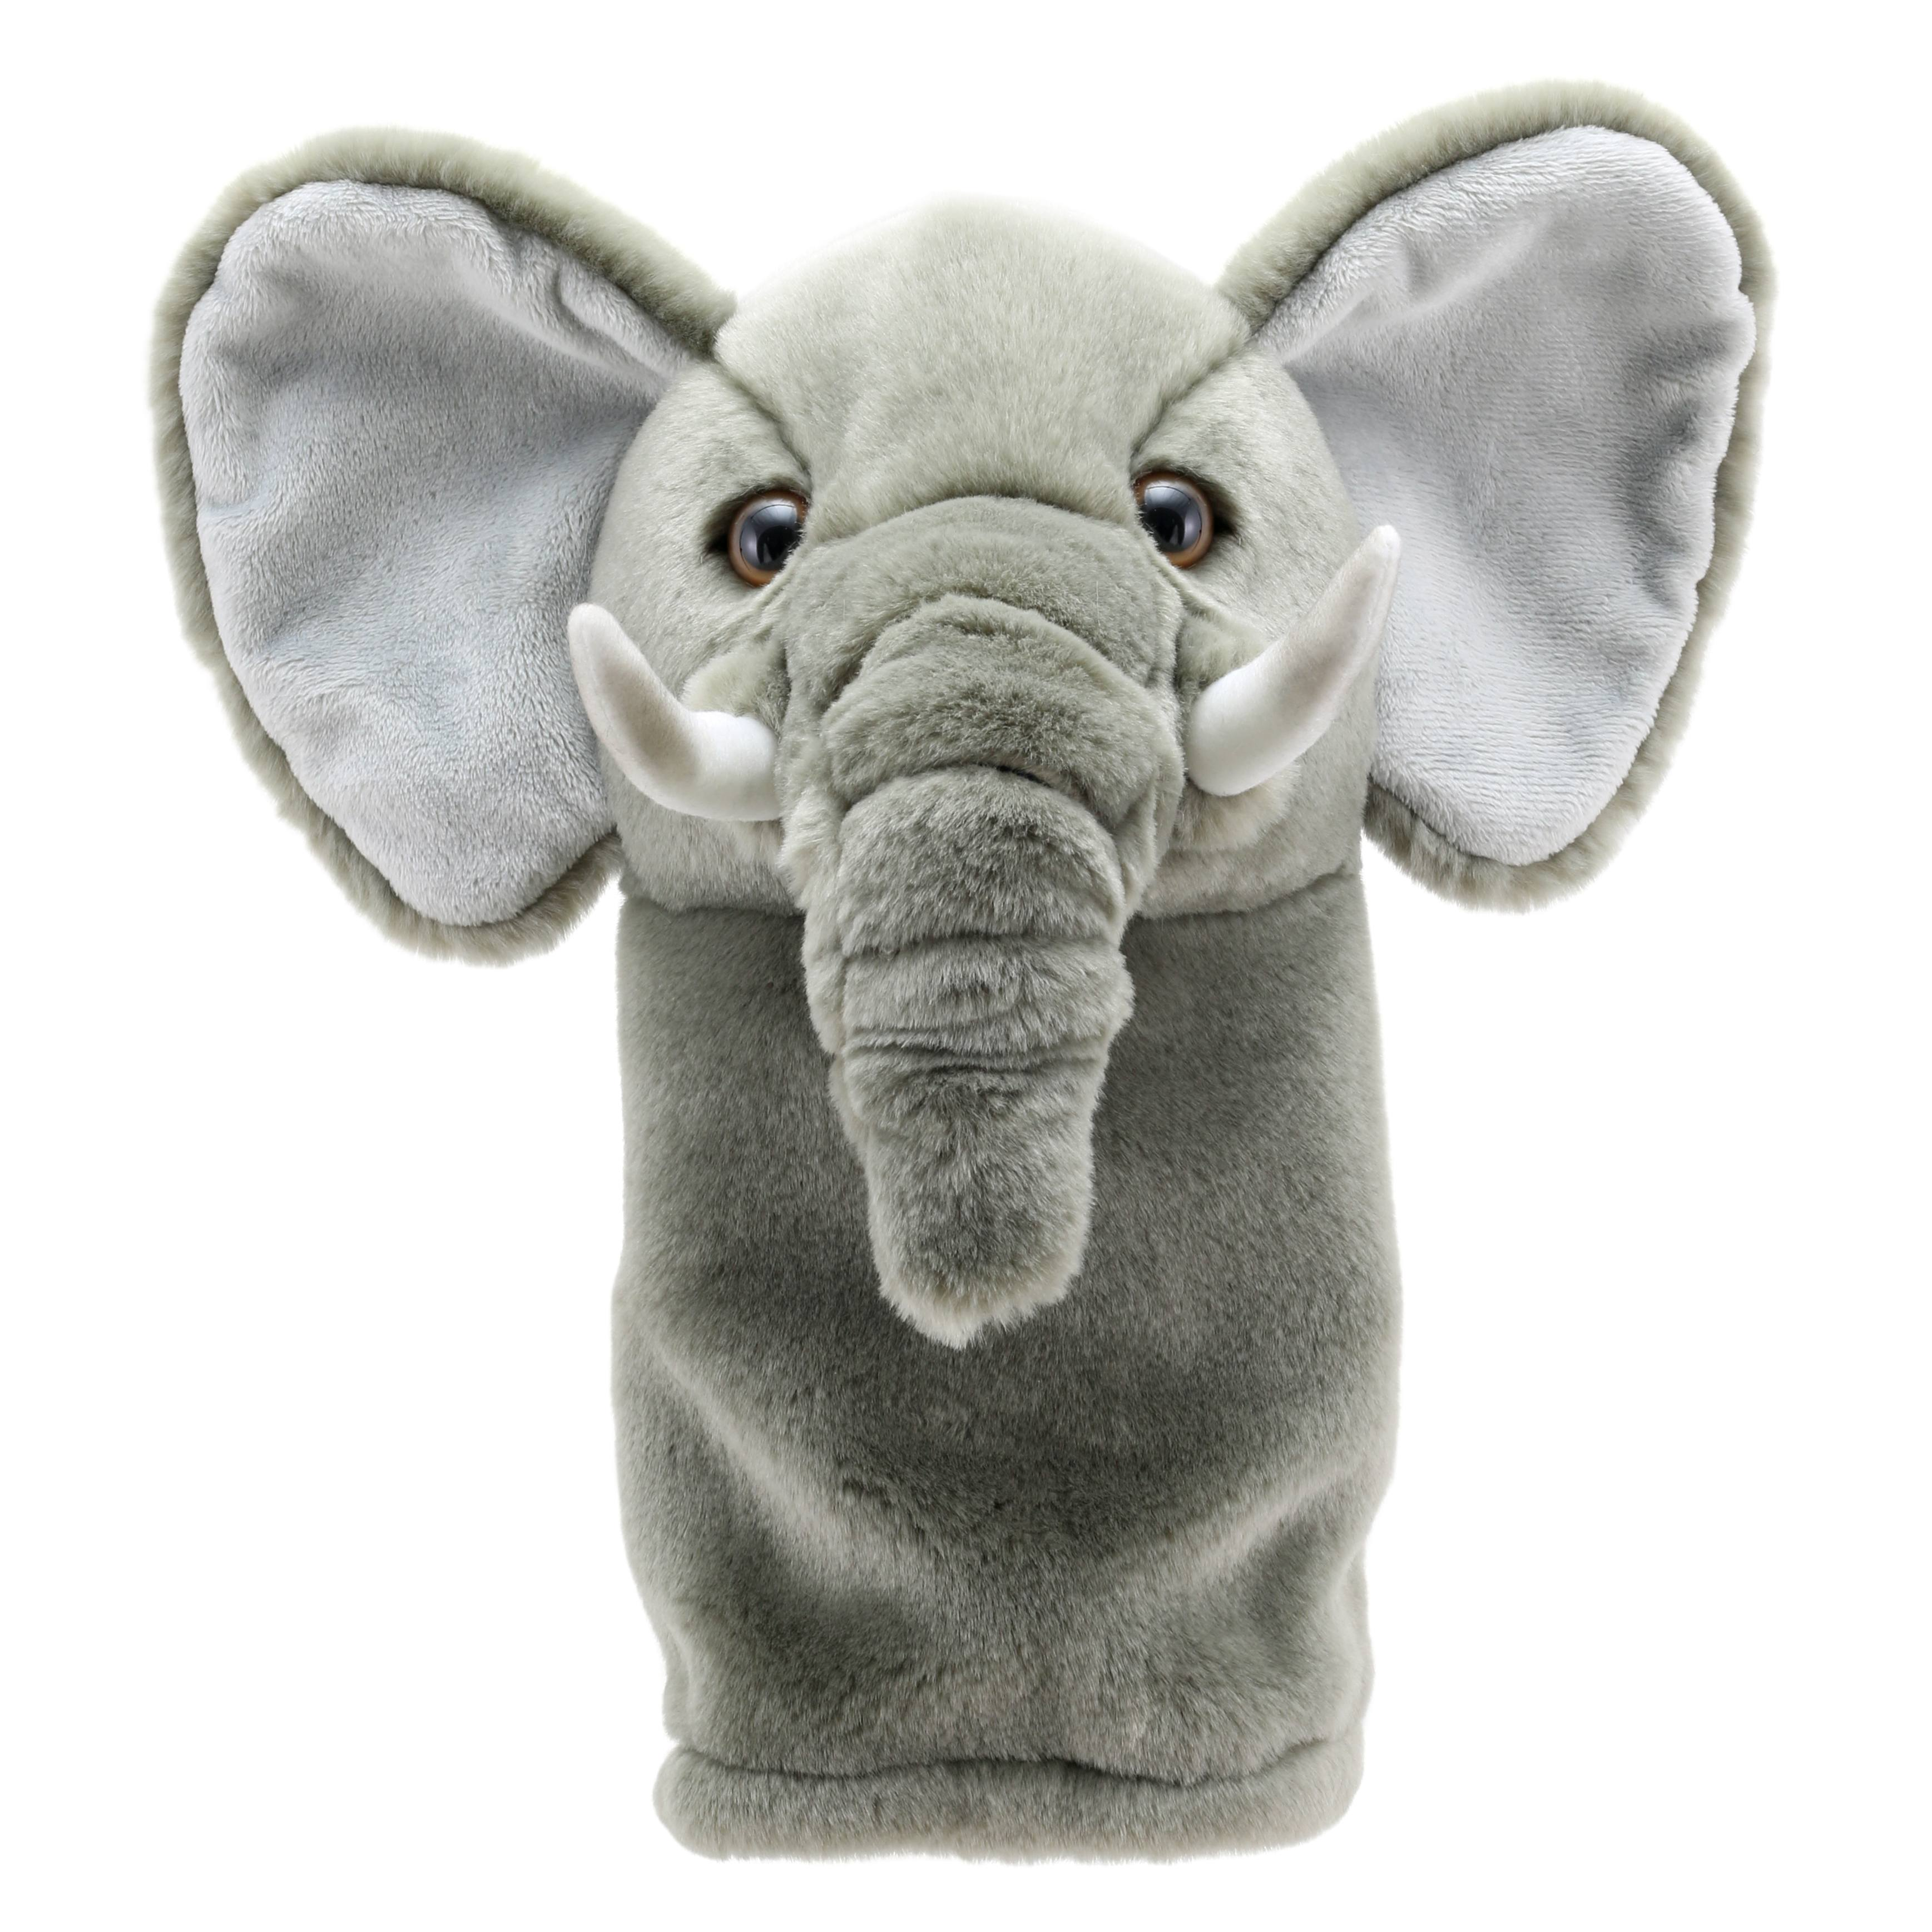 Elephant - Golf Head Cover